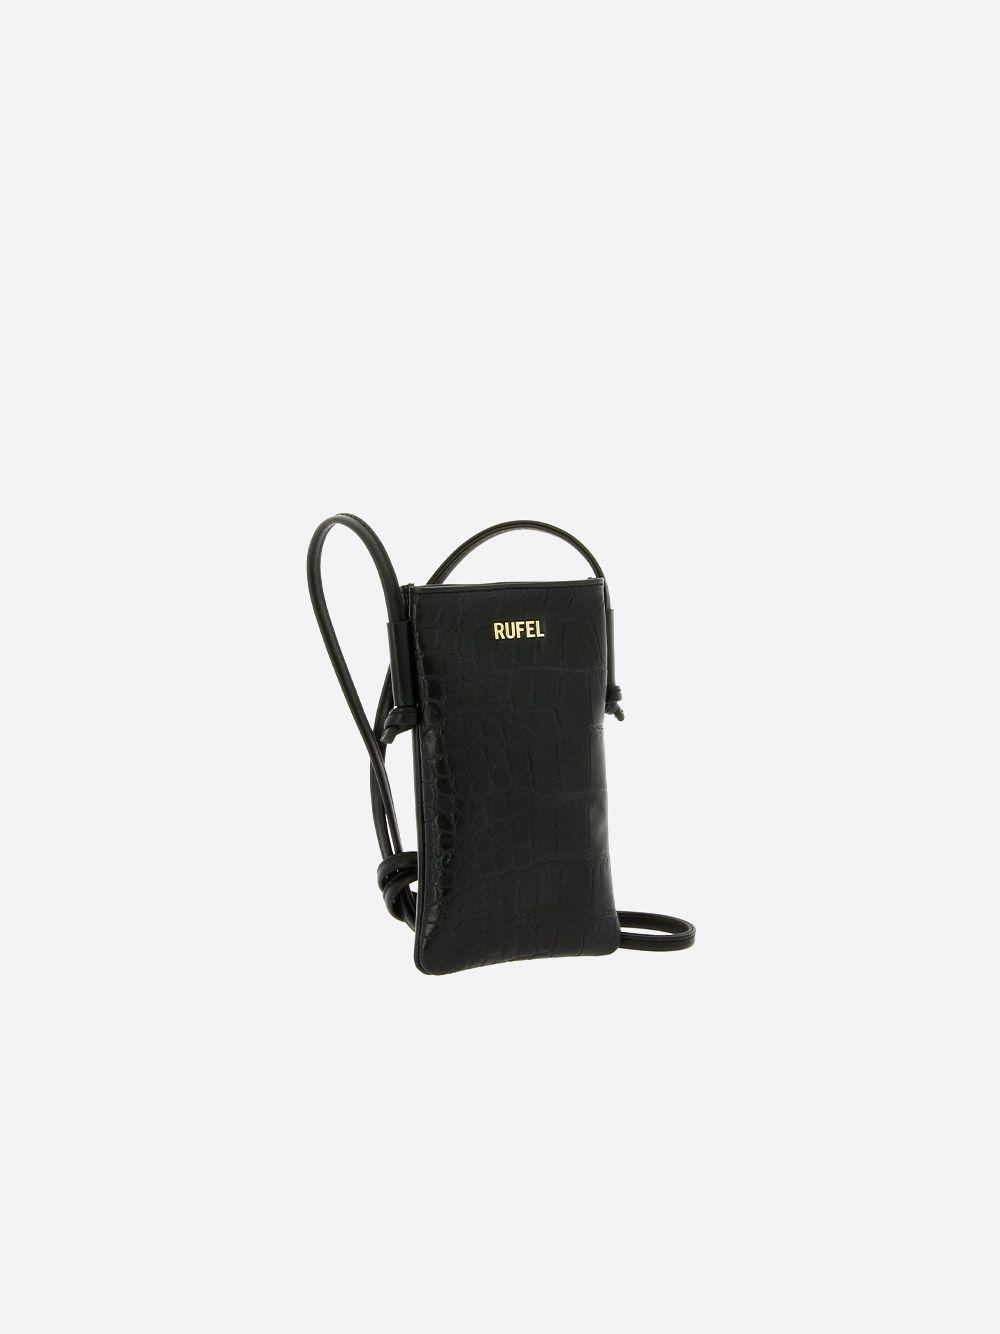 Small Black Crossbody Bag | Rufel